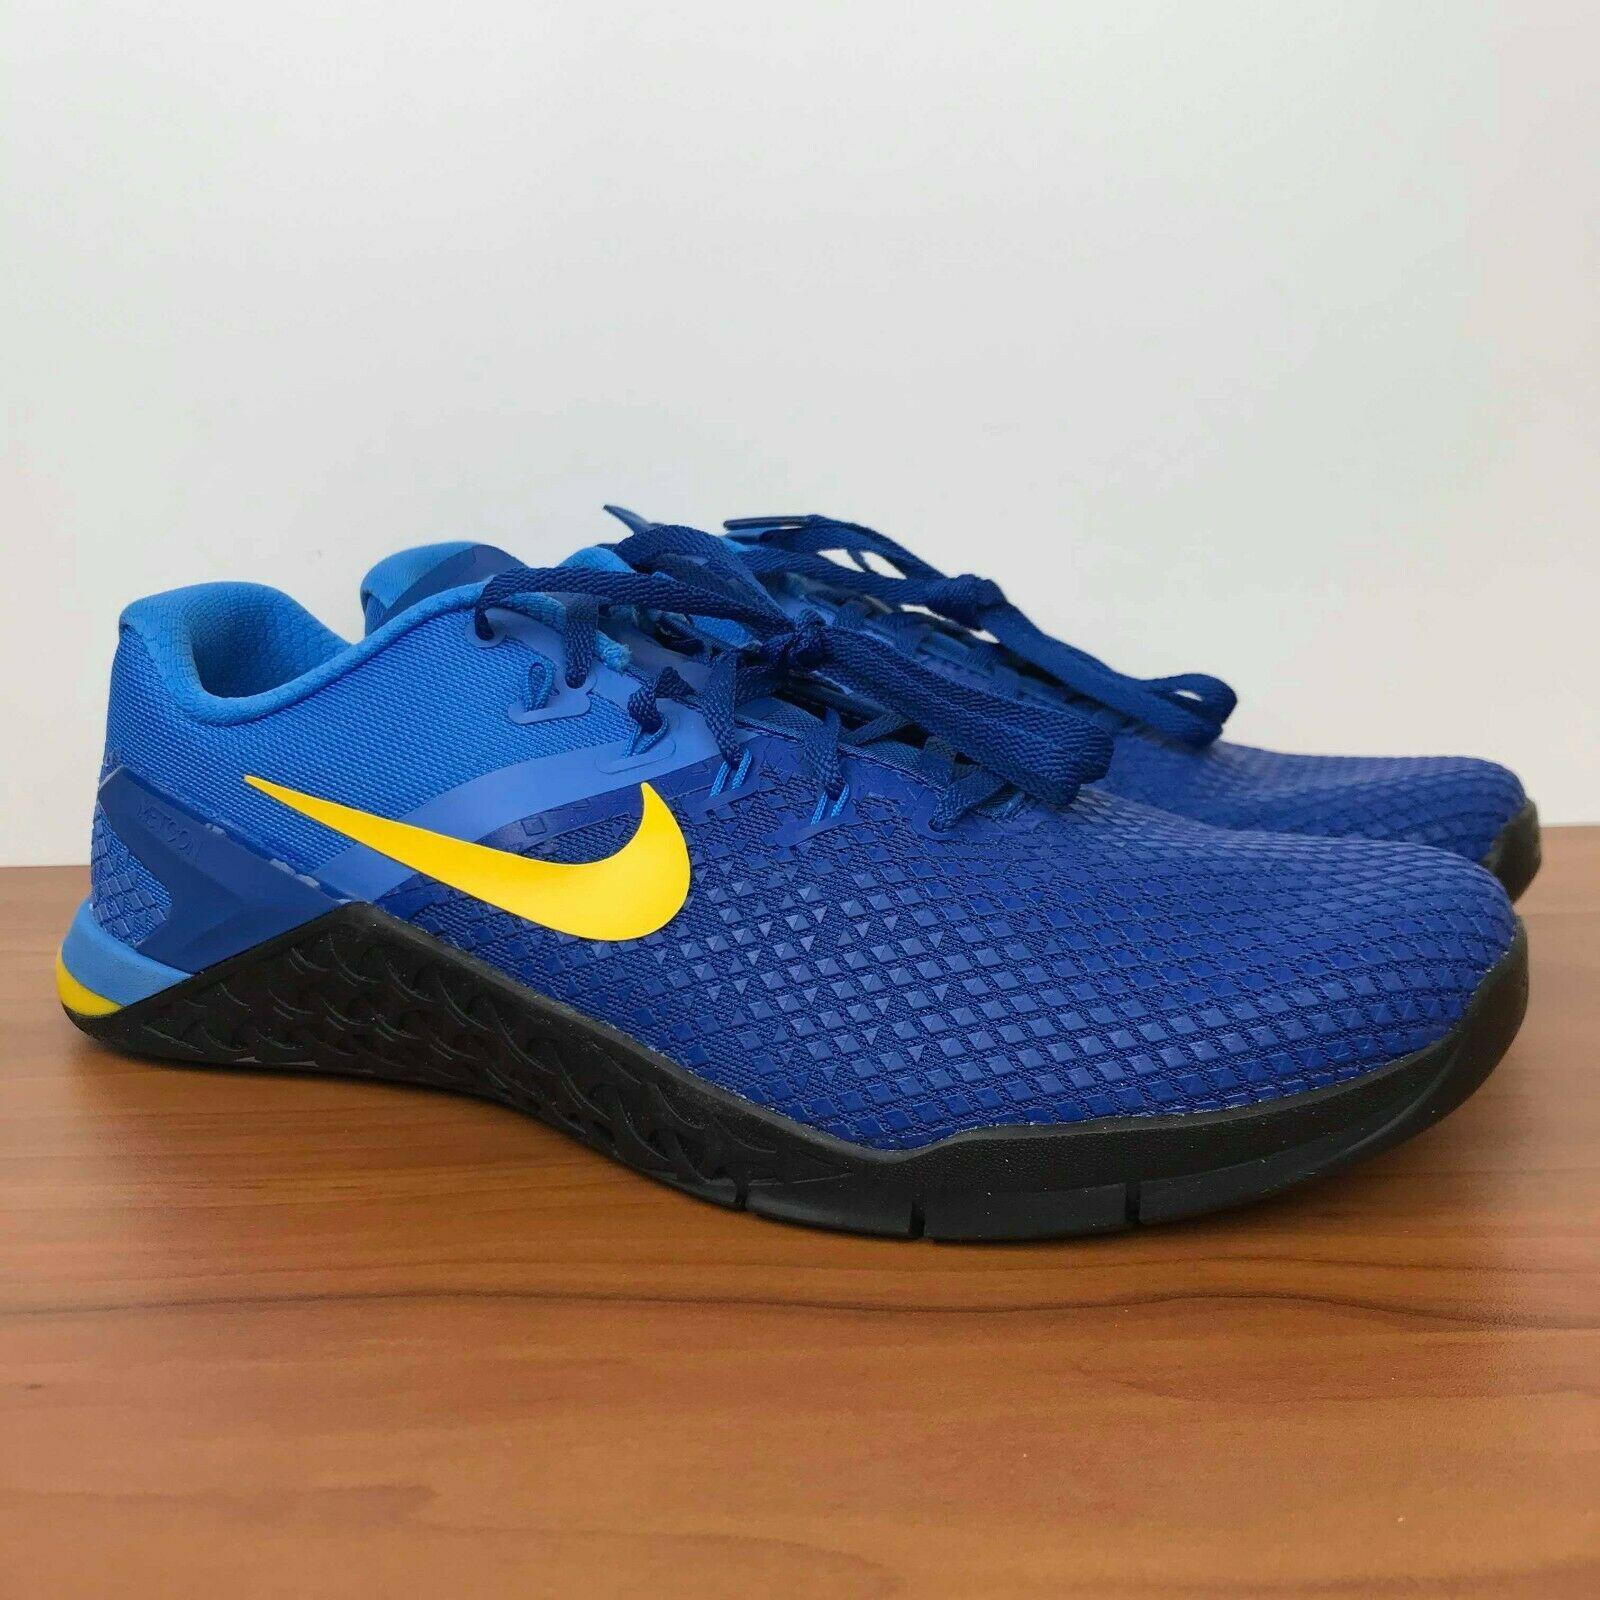 44++ Royal blue nike shoes ideas information